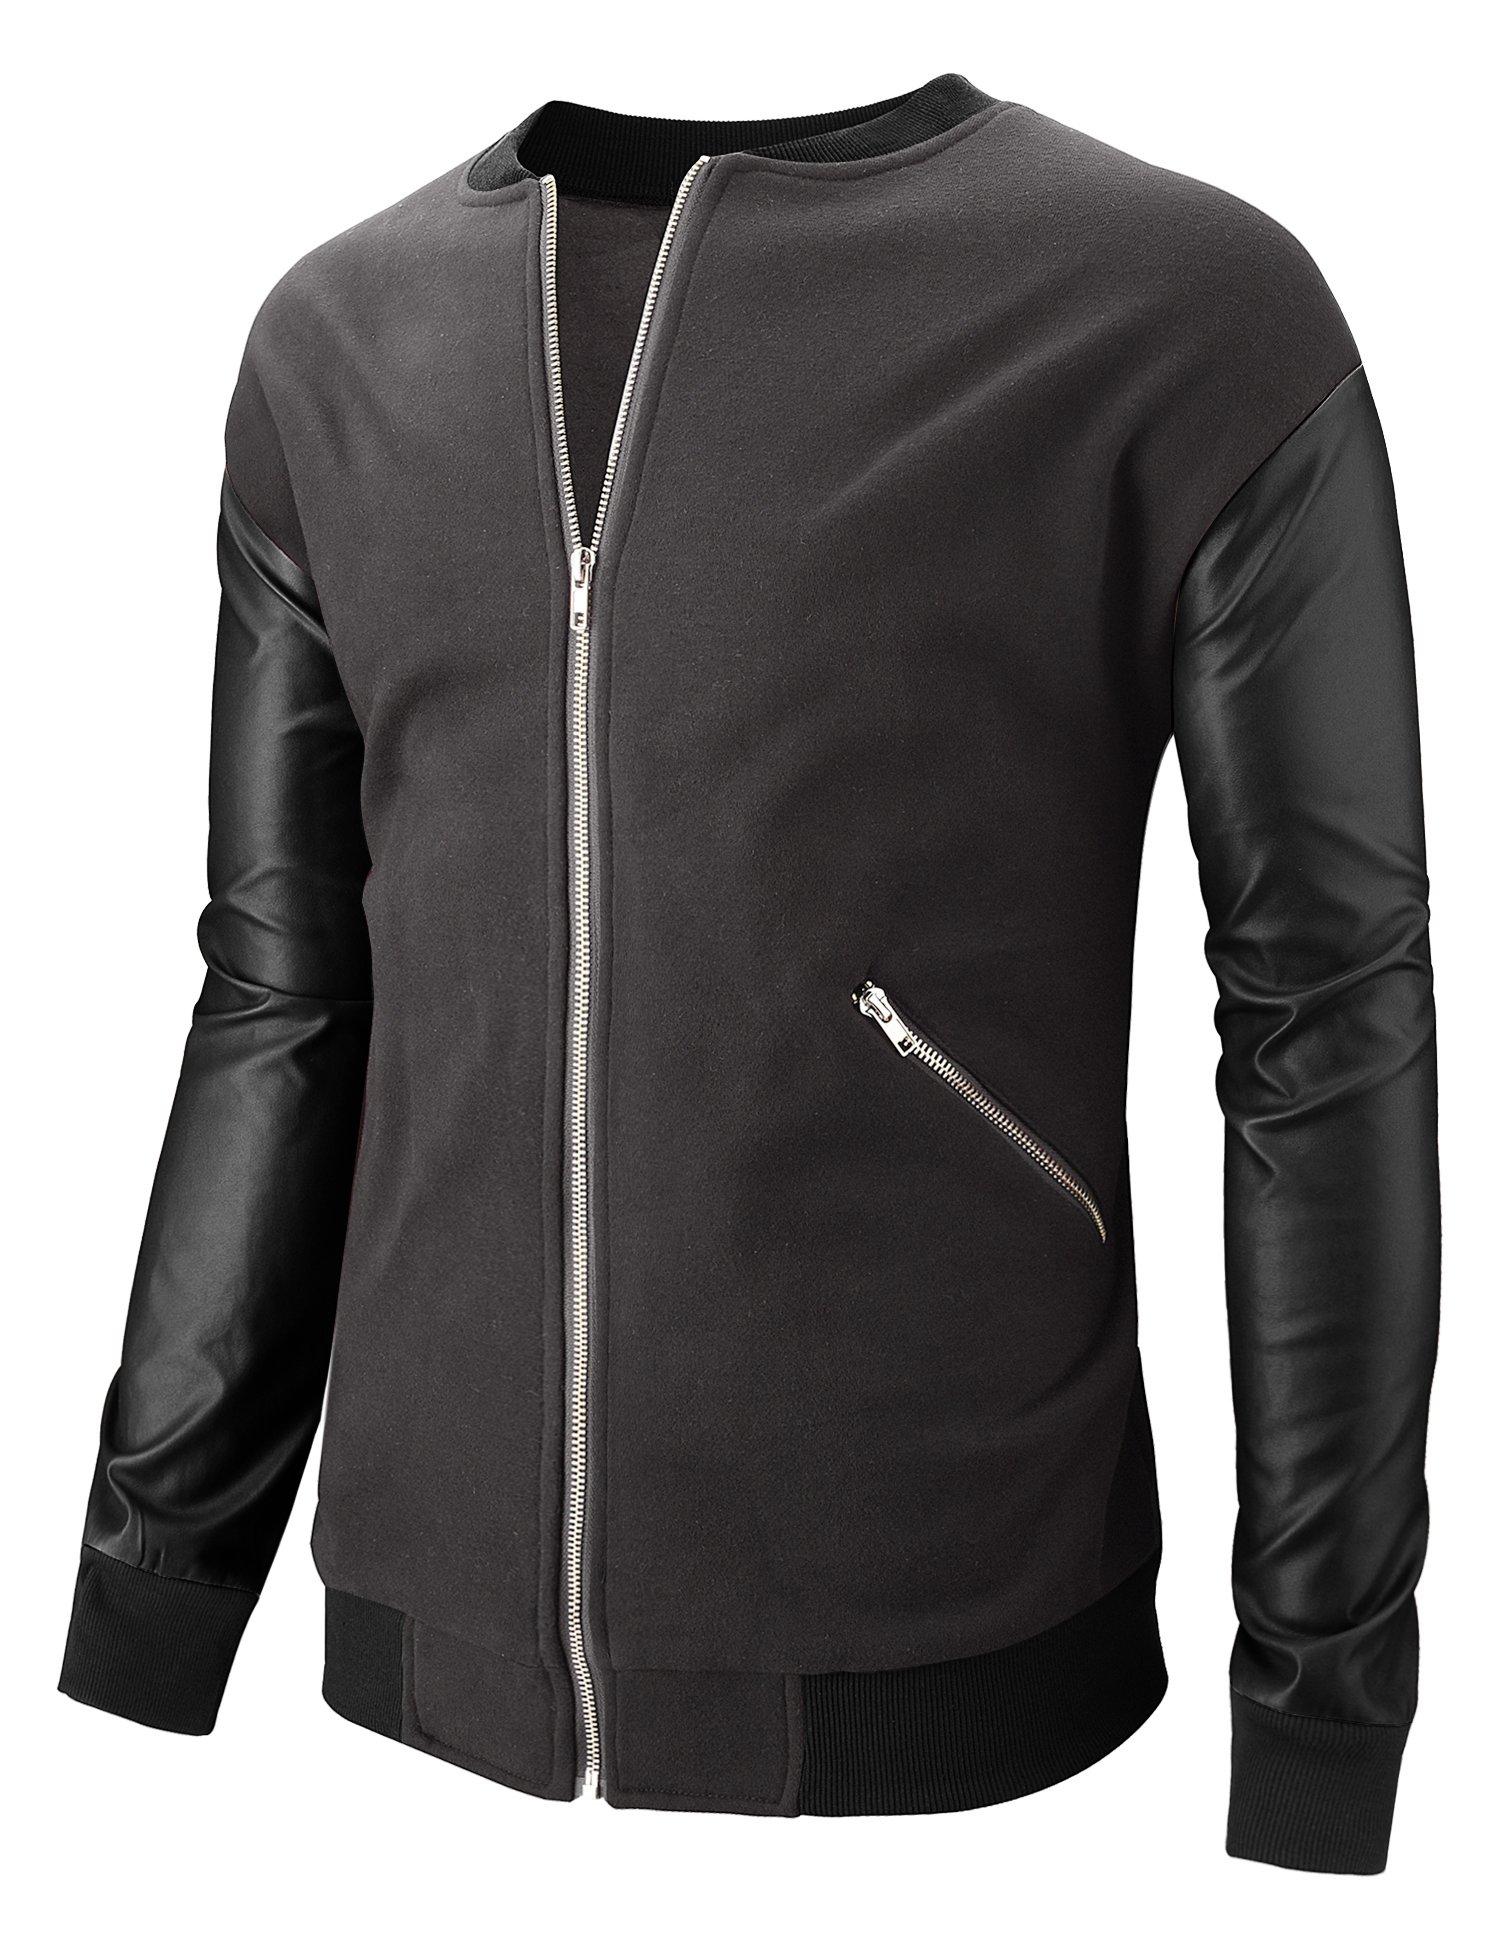 Hasuit Mens Baseball Jacket Varsity Baseball Cotton Jacket Letterman jacket